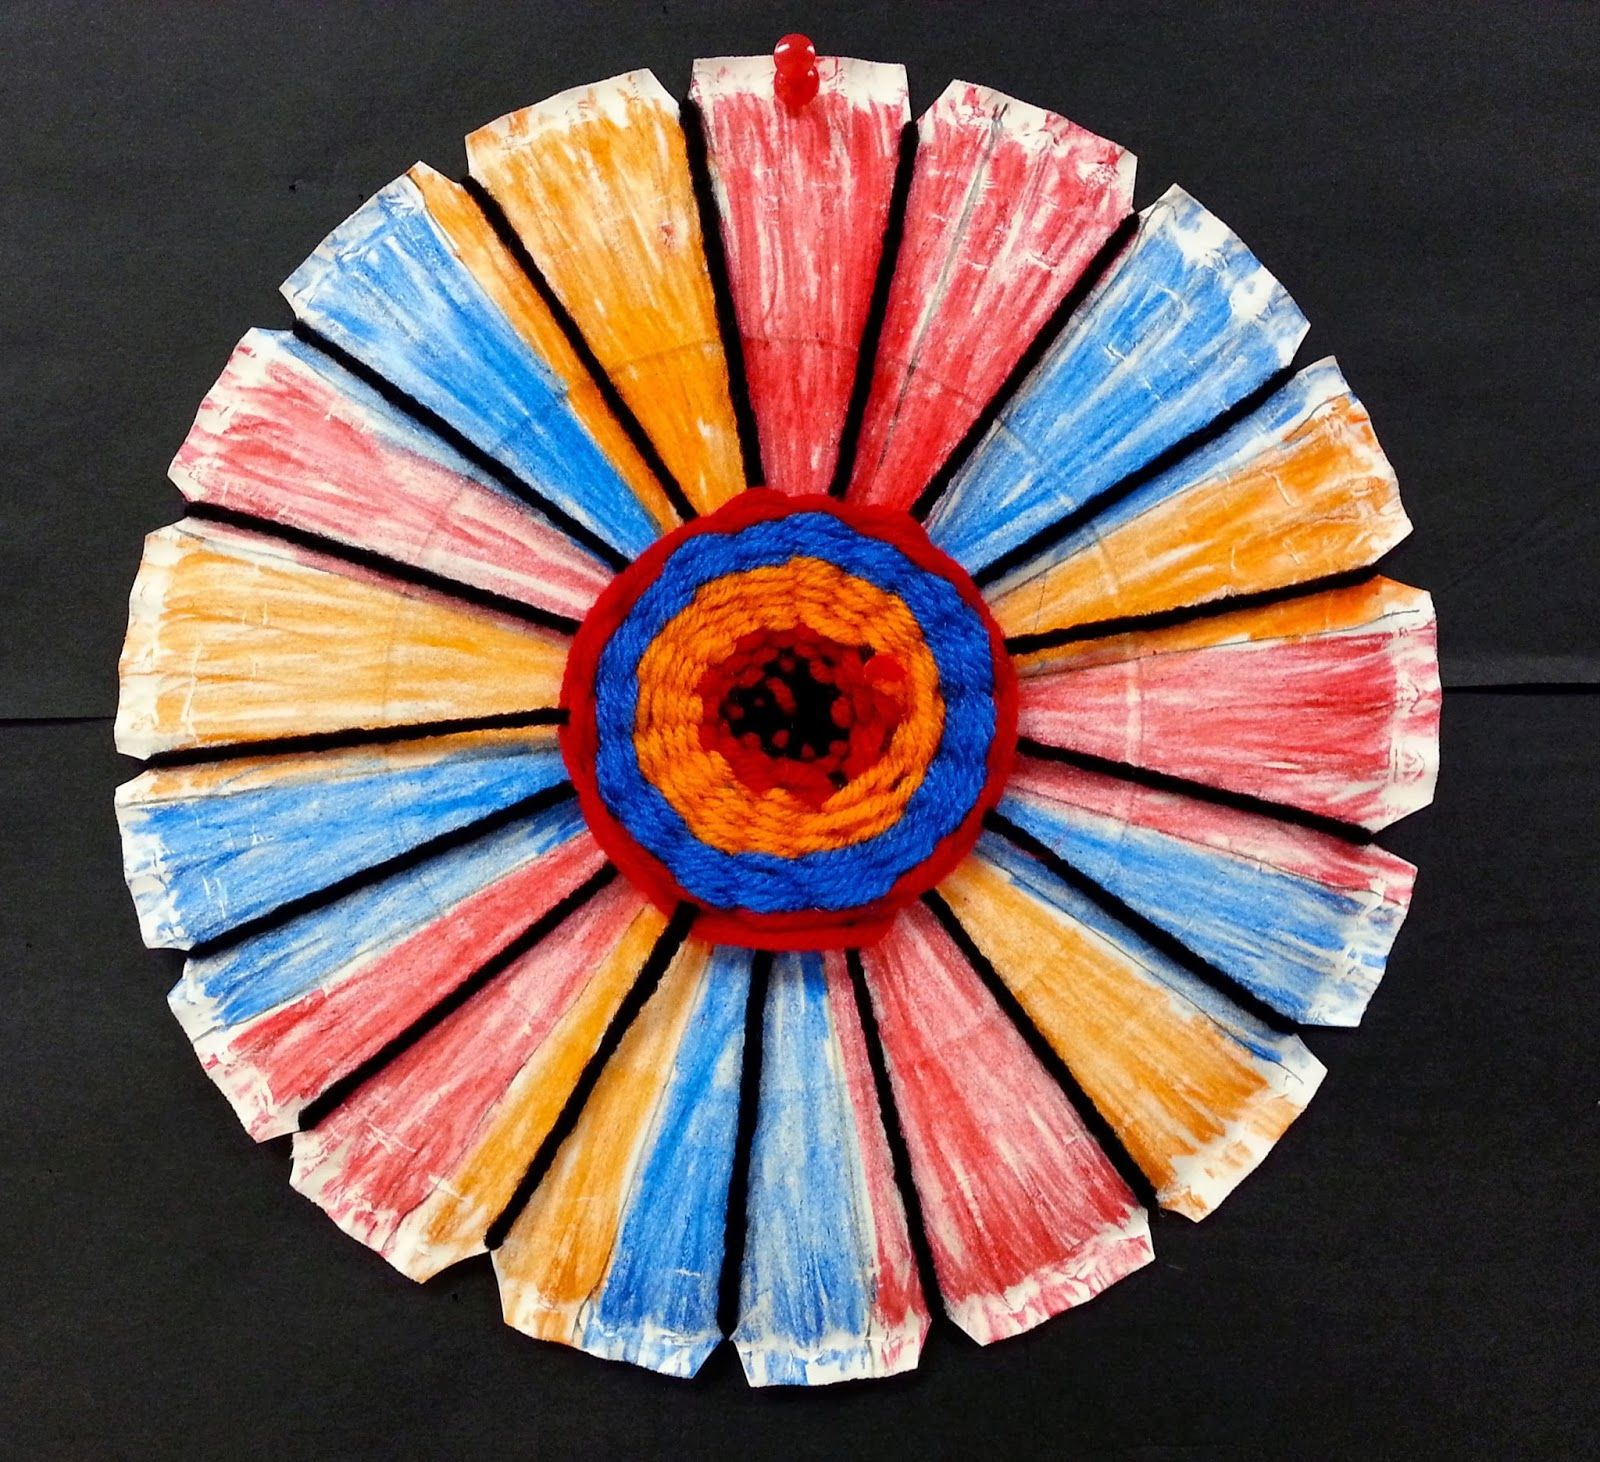 Art with Ms. Gram: Navajo- inspired Radial Weaving (3rd)